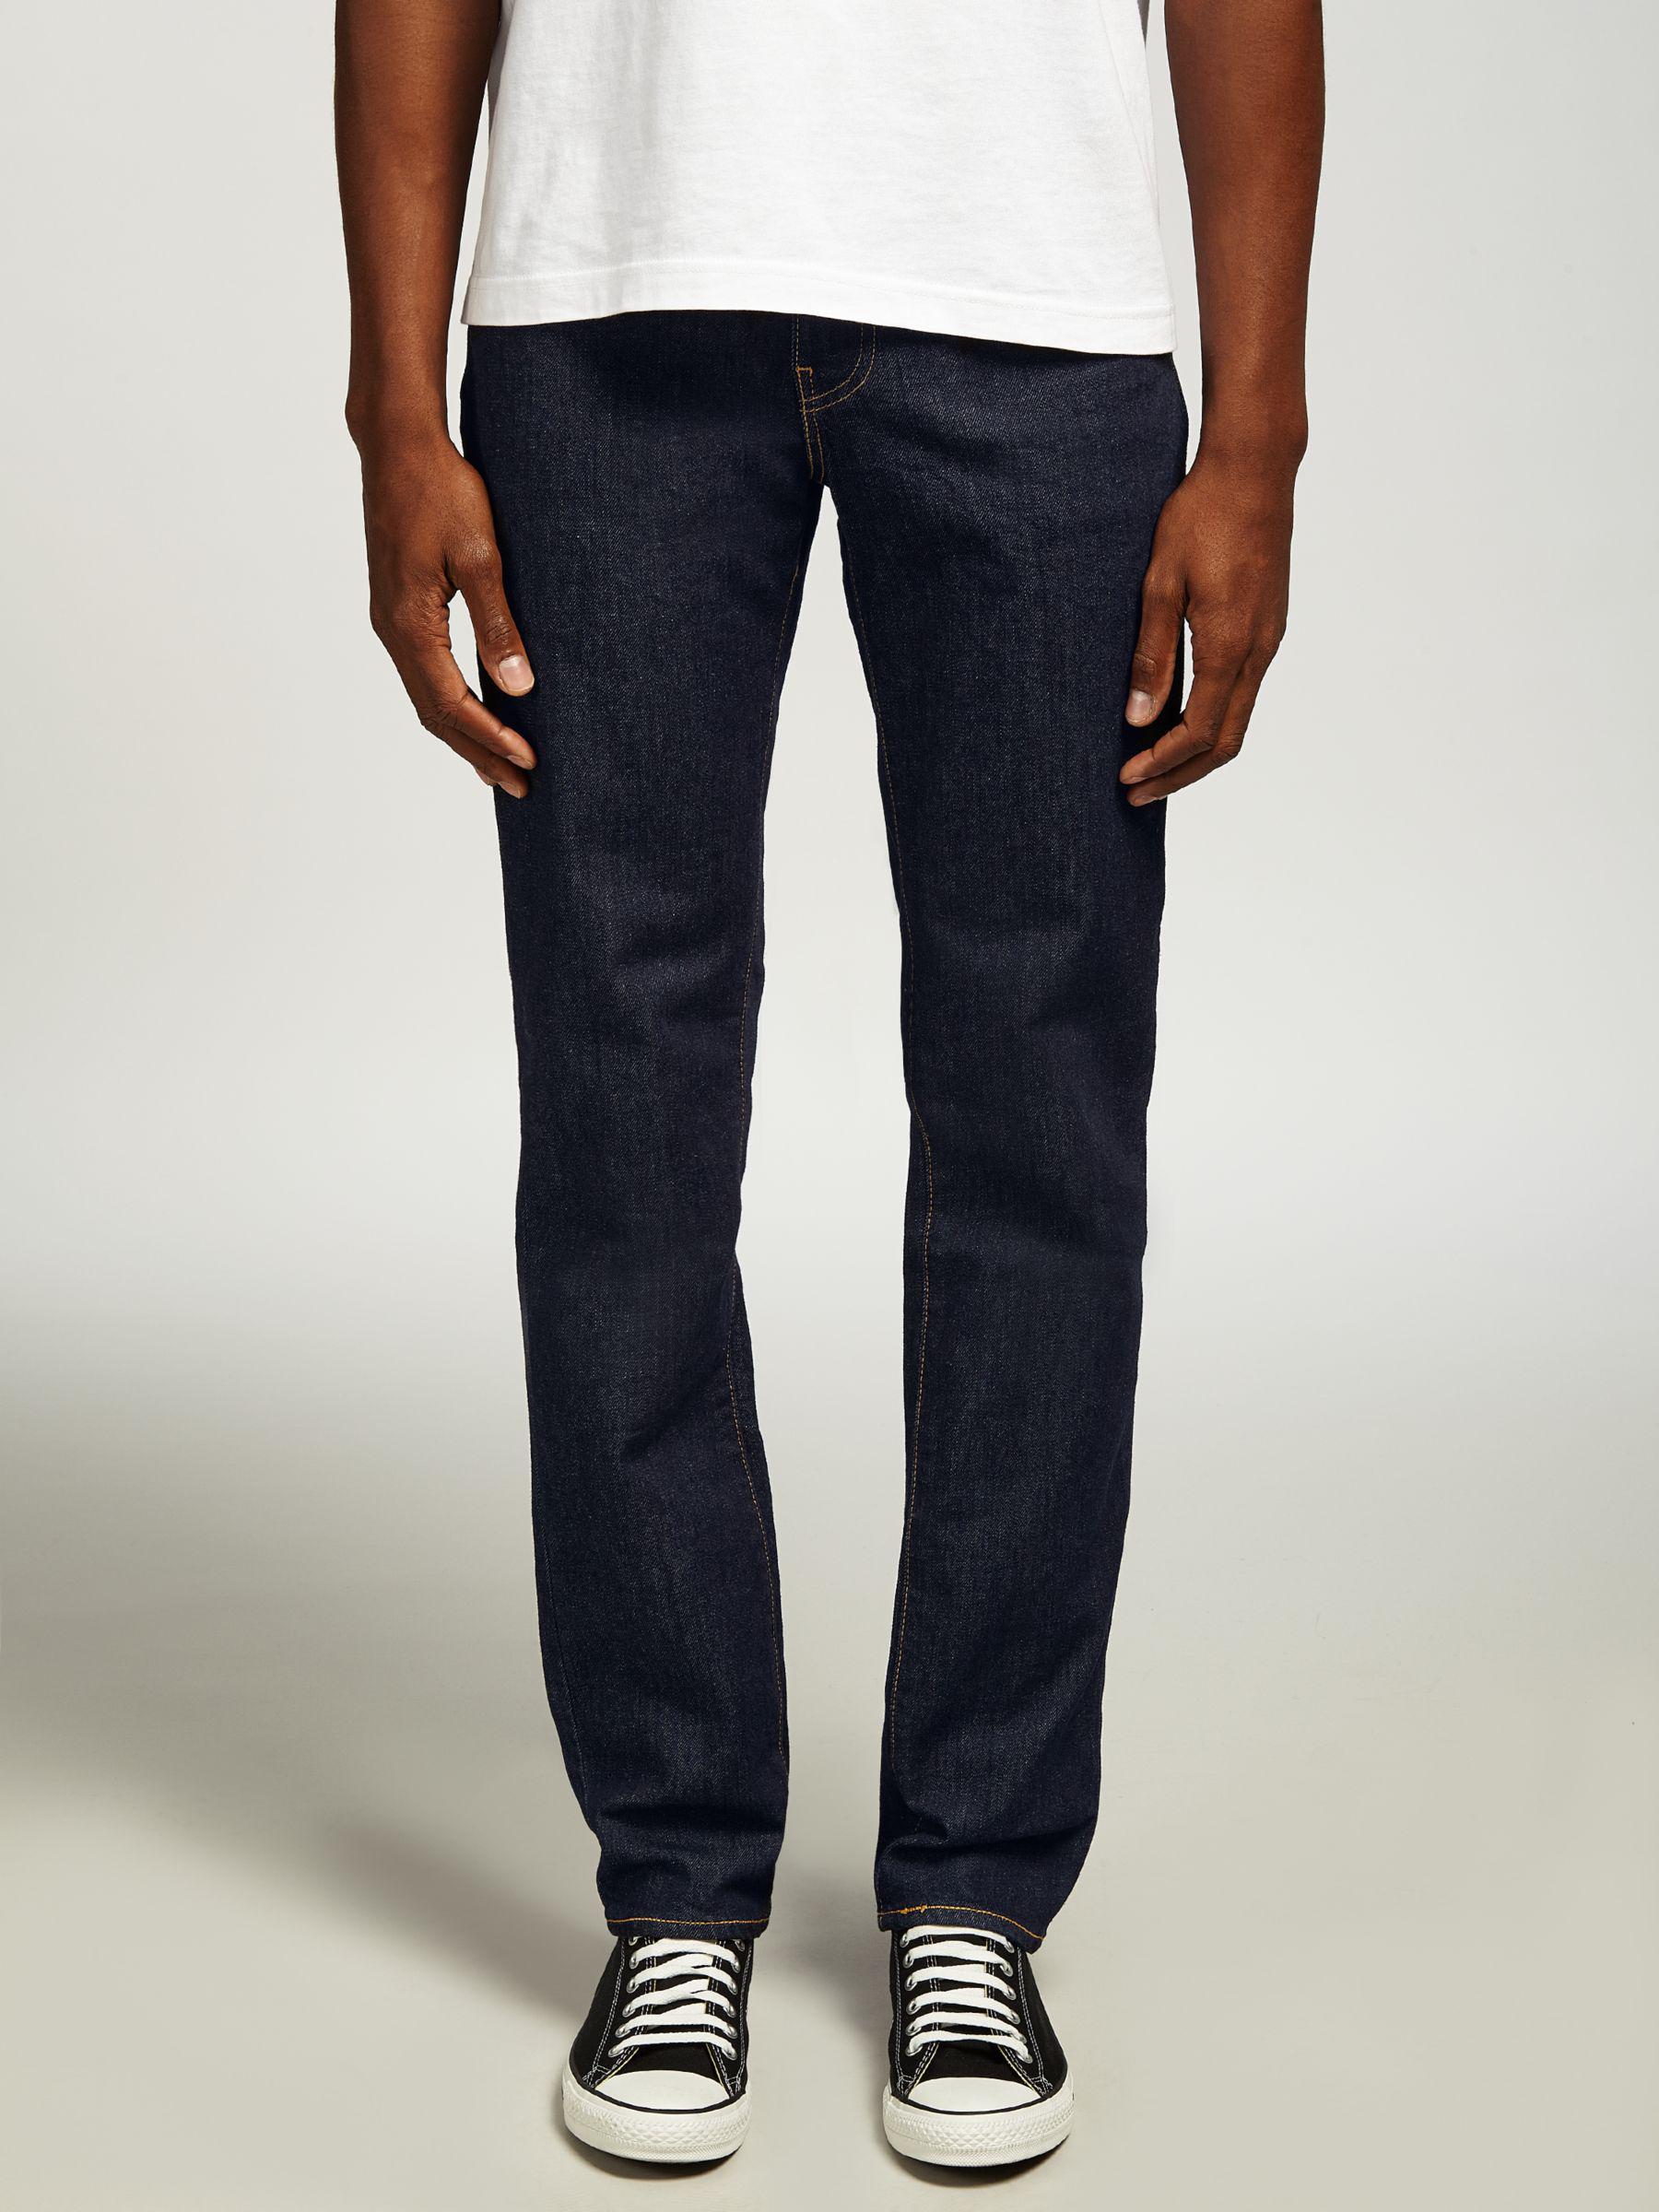 caeb0a039590e Levi s 511 Slim Fit Rock Cod Jeans in Blue for Men - Lyst